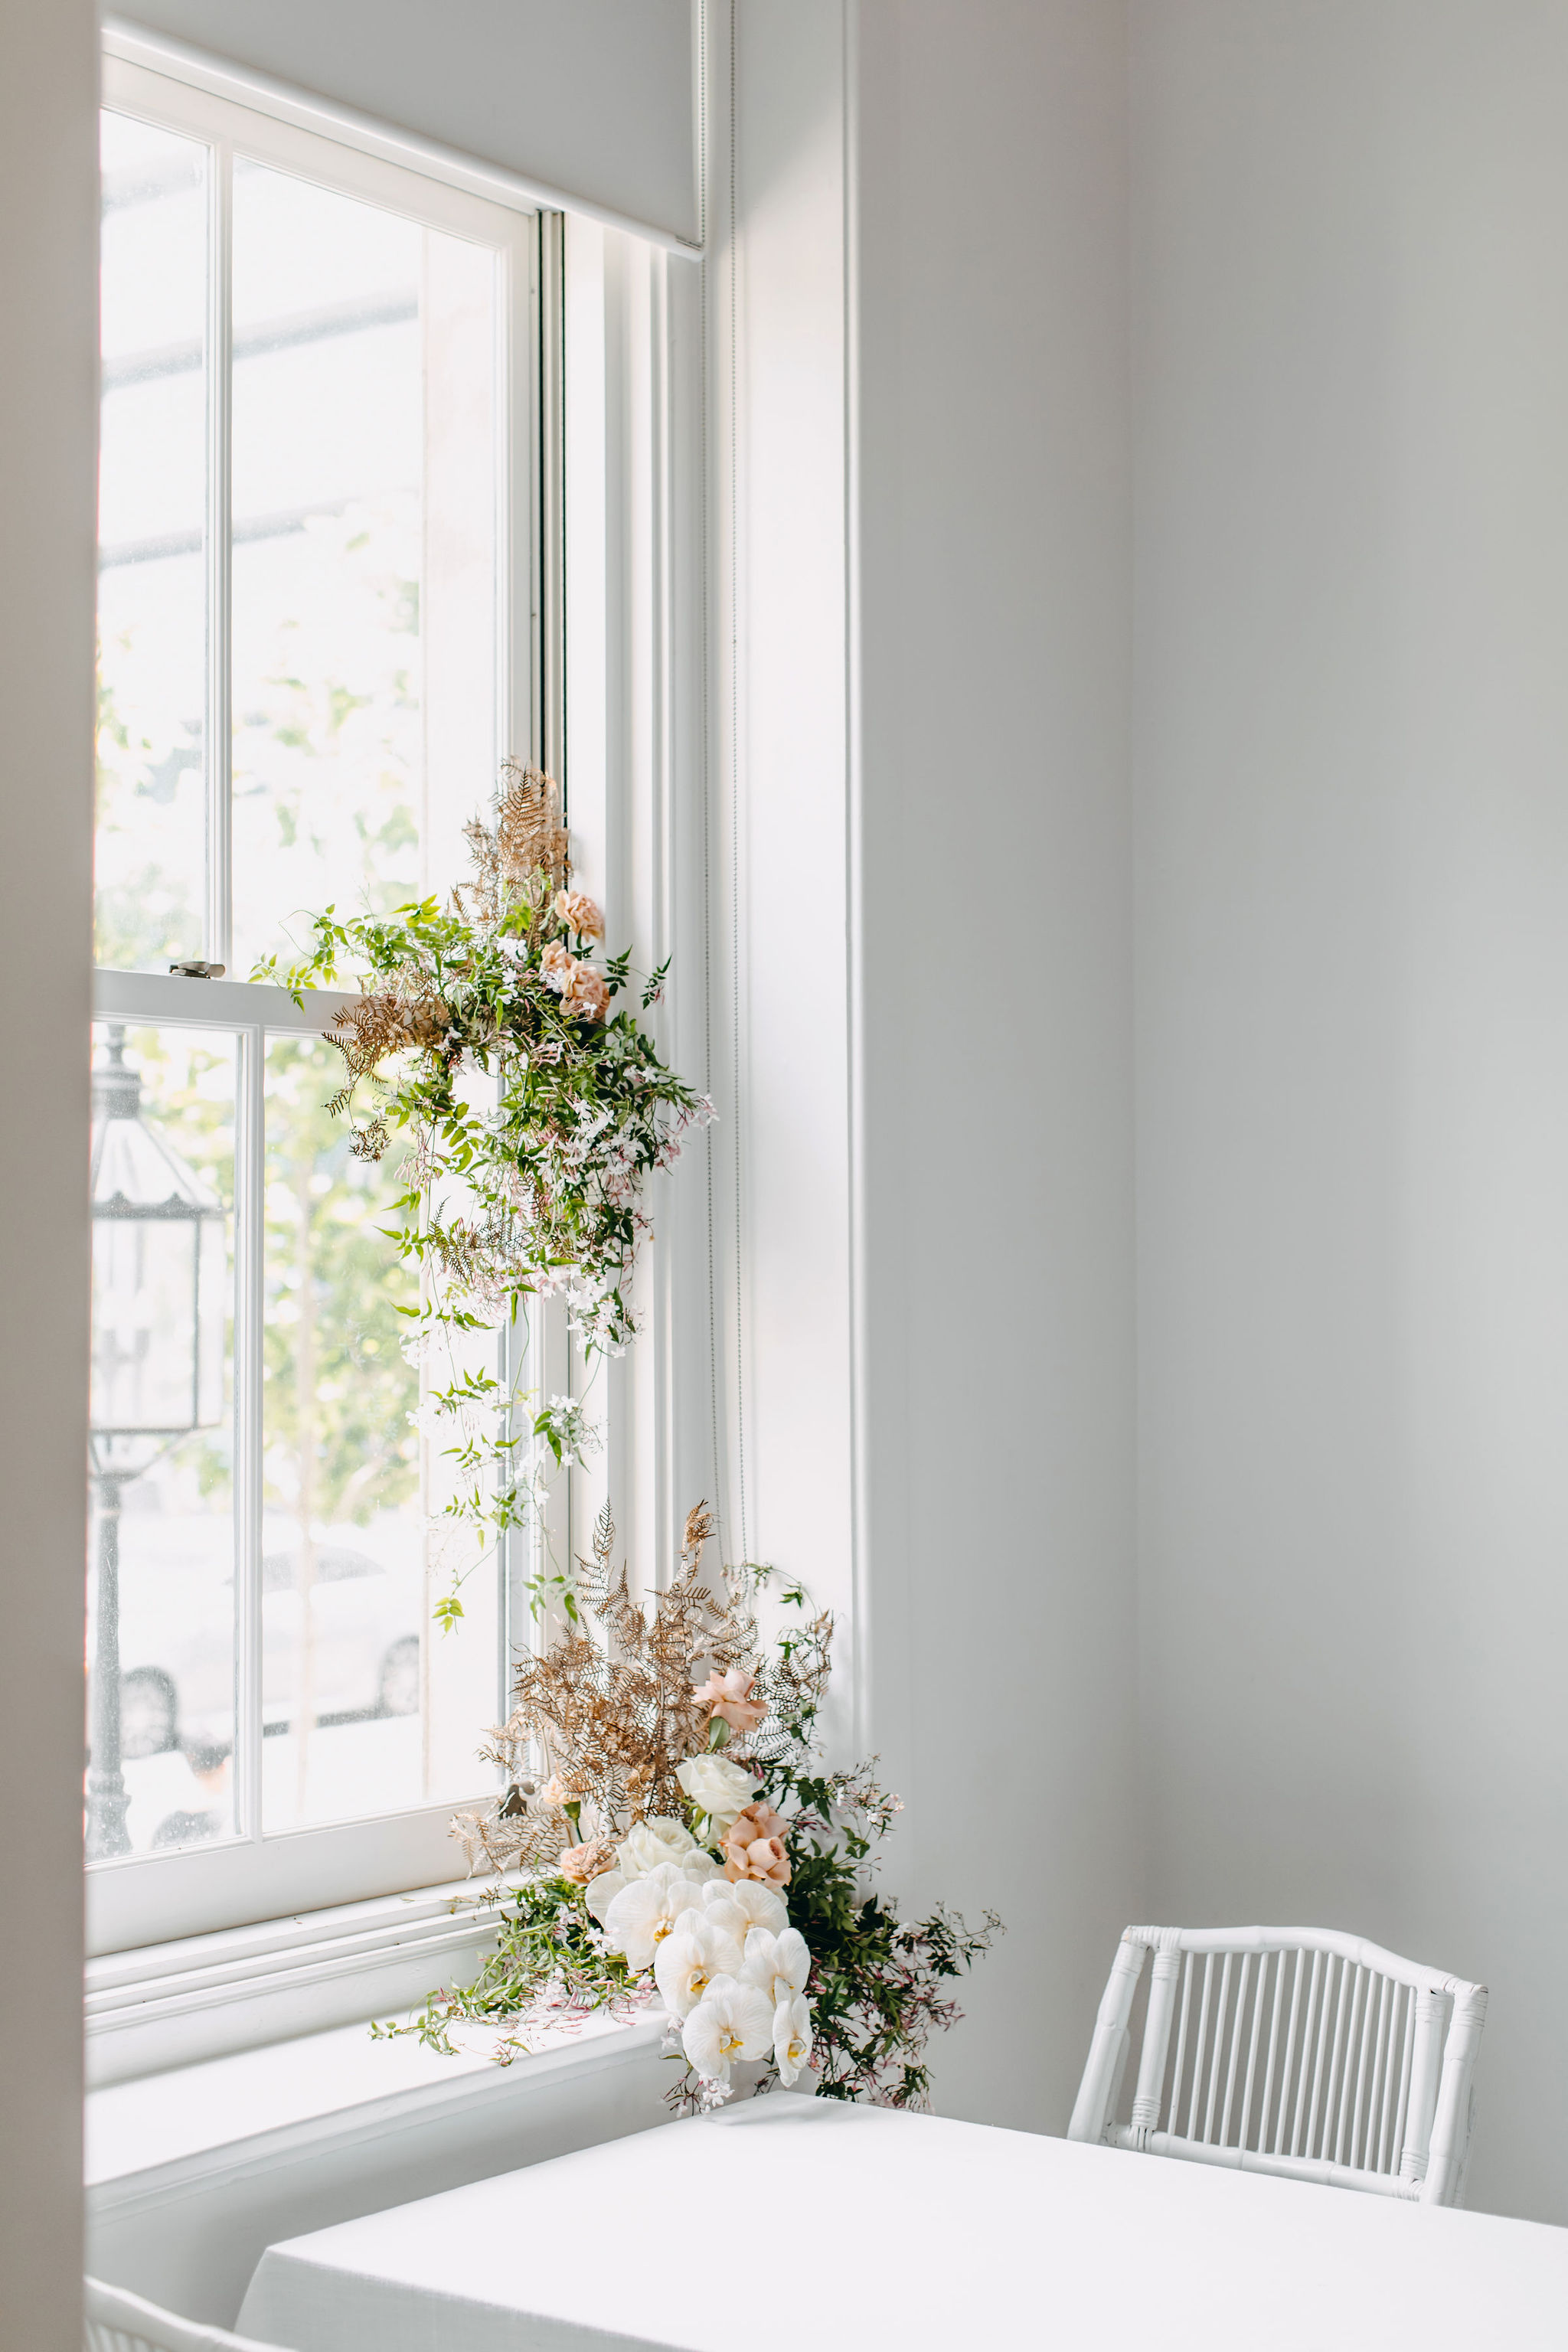 206-WEDDINGSTYLEDSHOOT-STATEBUILDINGS-28OCT2019